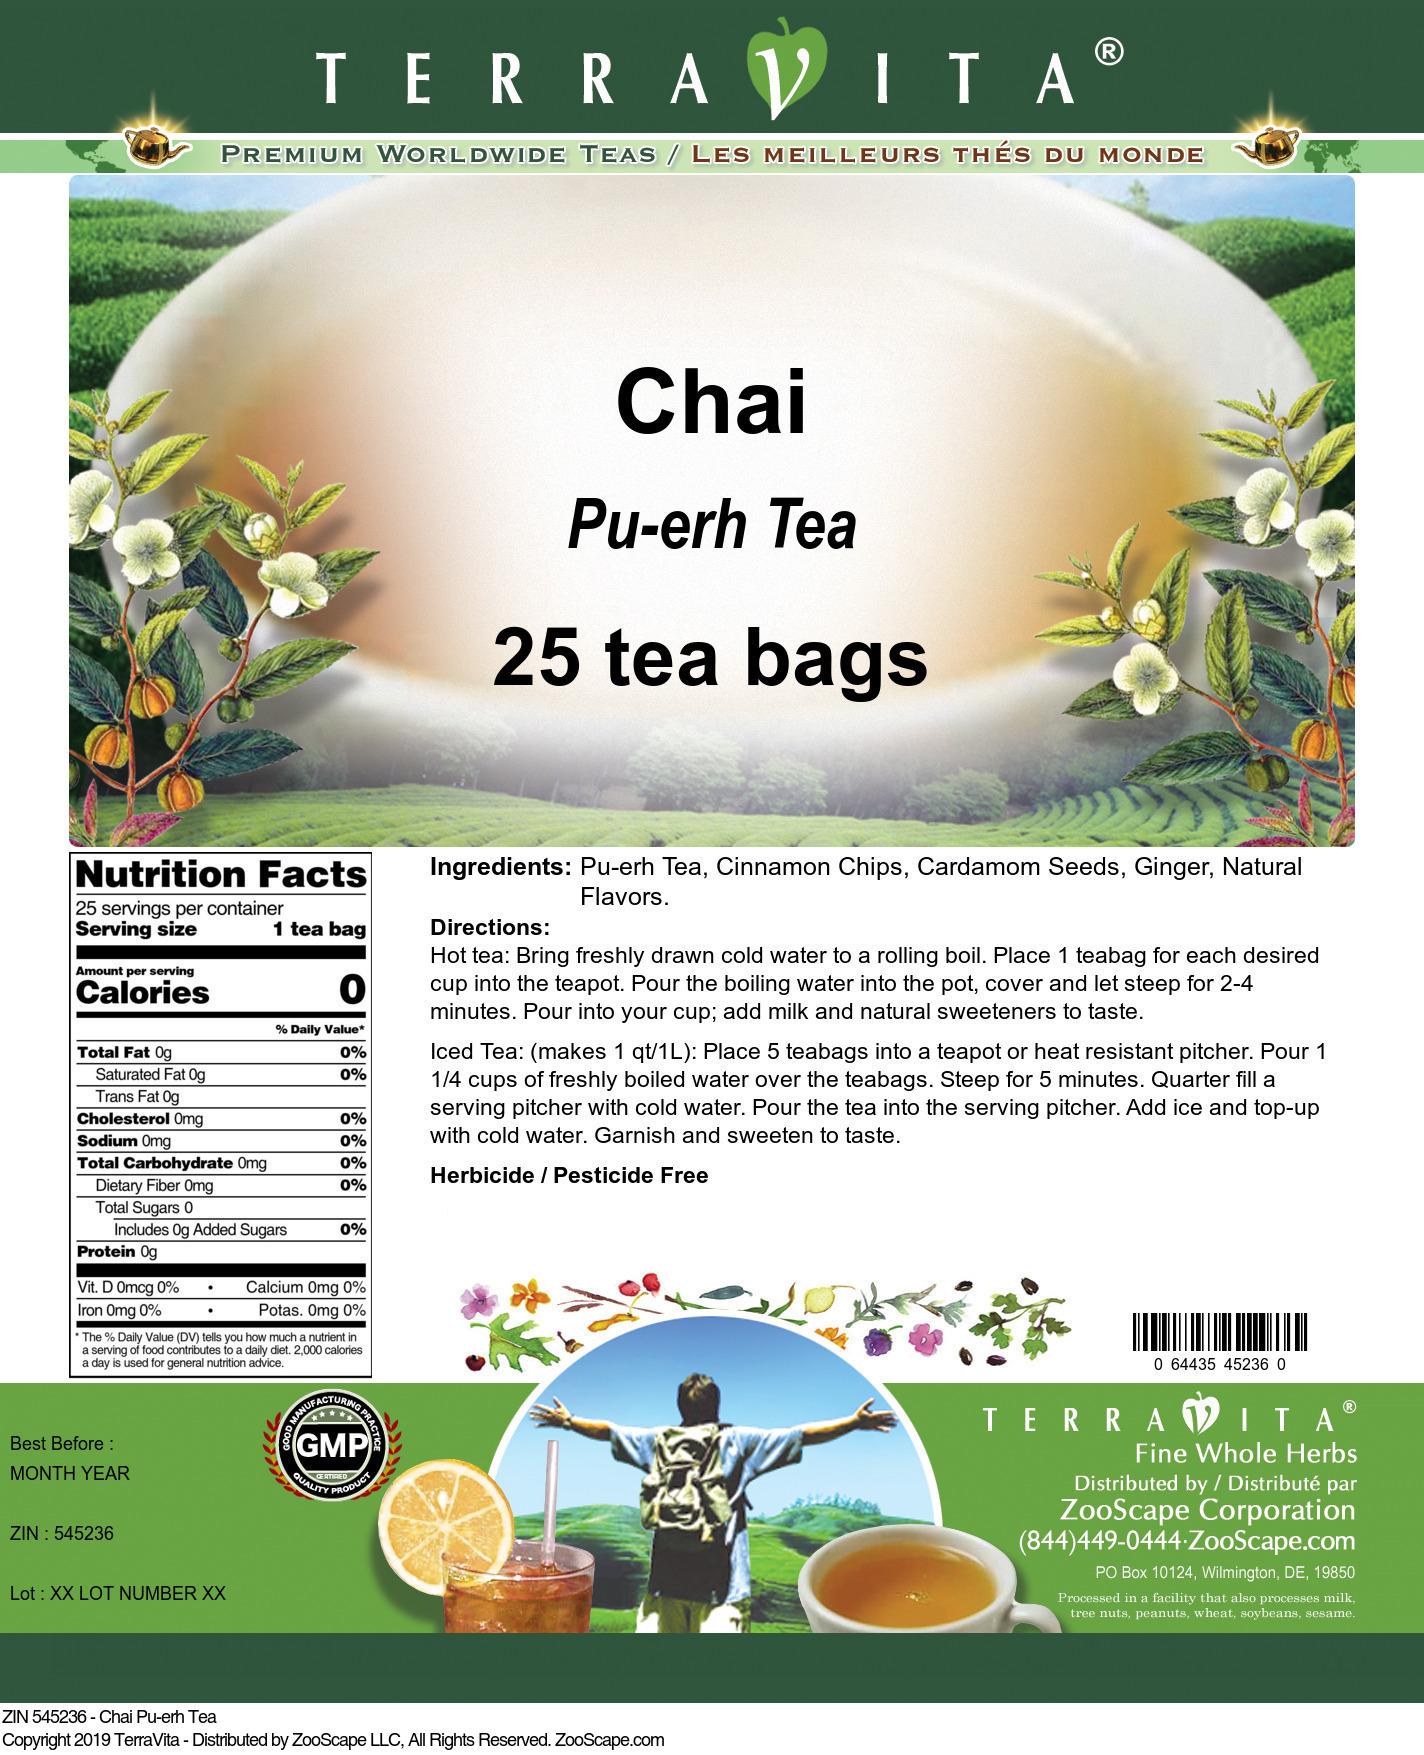 Chai Pu-erh Tea